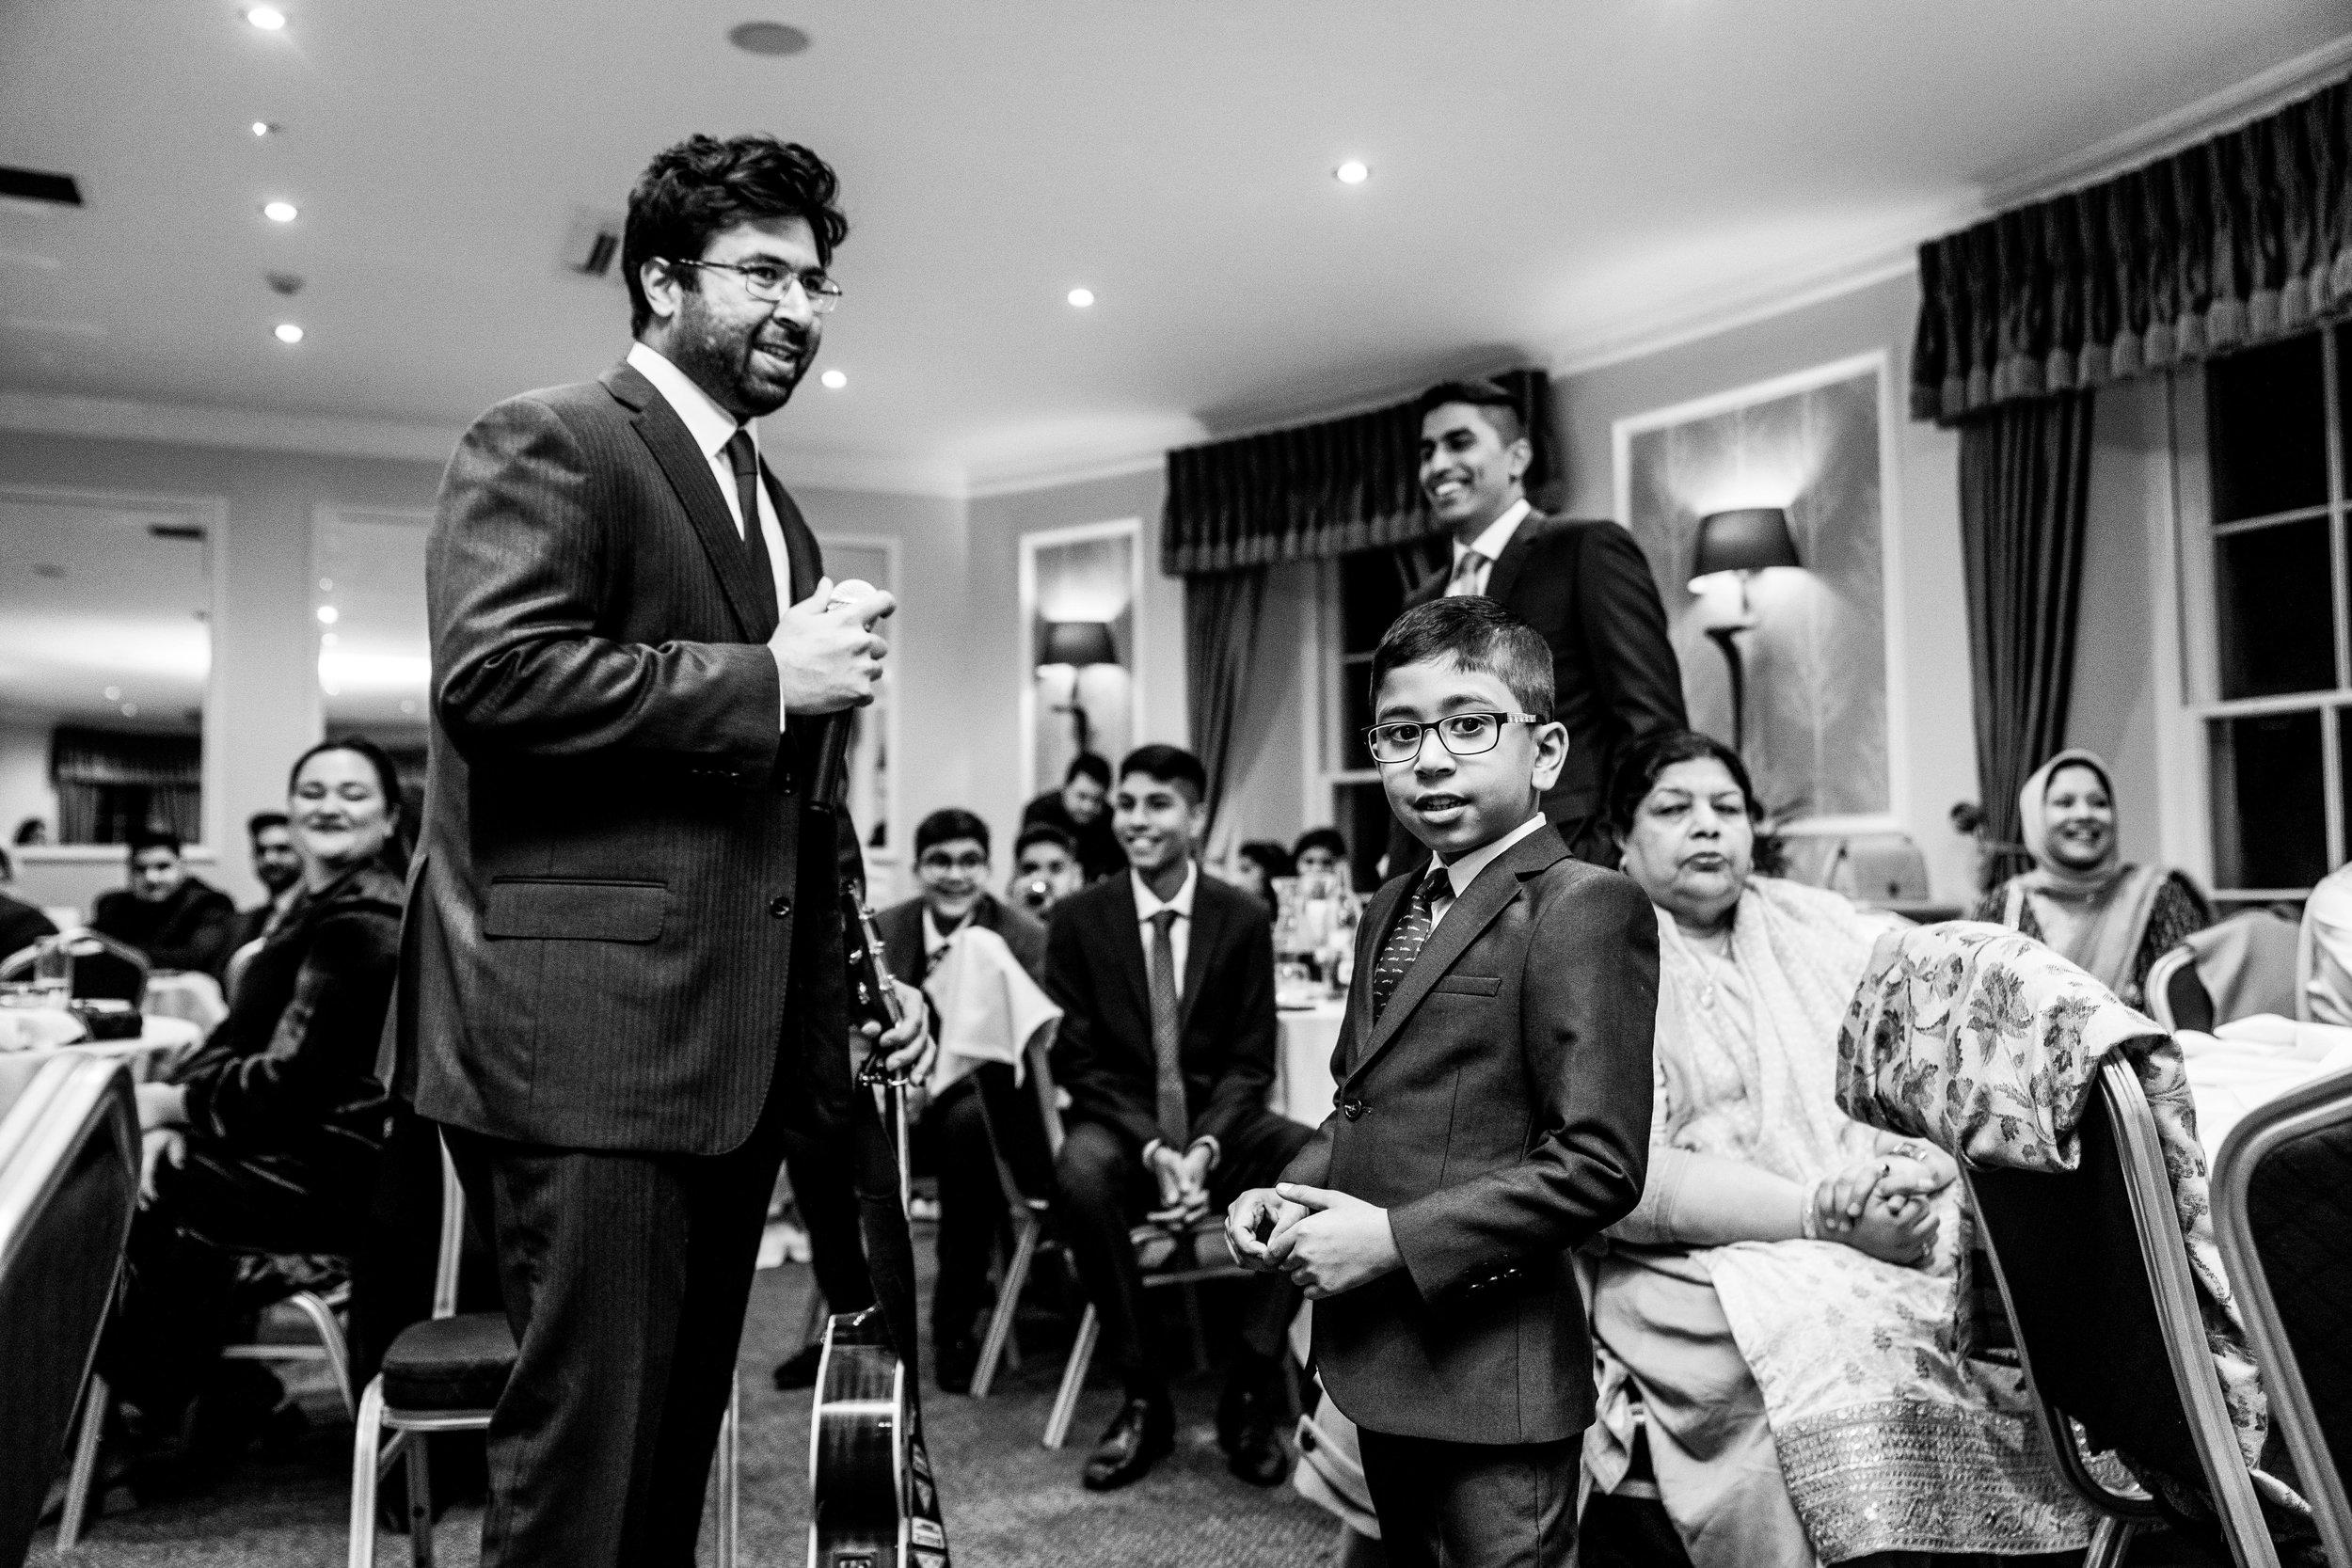 buckinghamshire-golf-club-winter-muslim-wedding-engagement-photography-videography-42